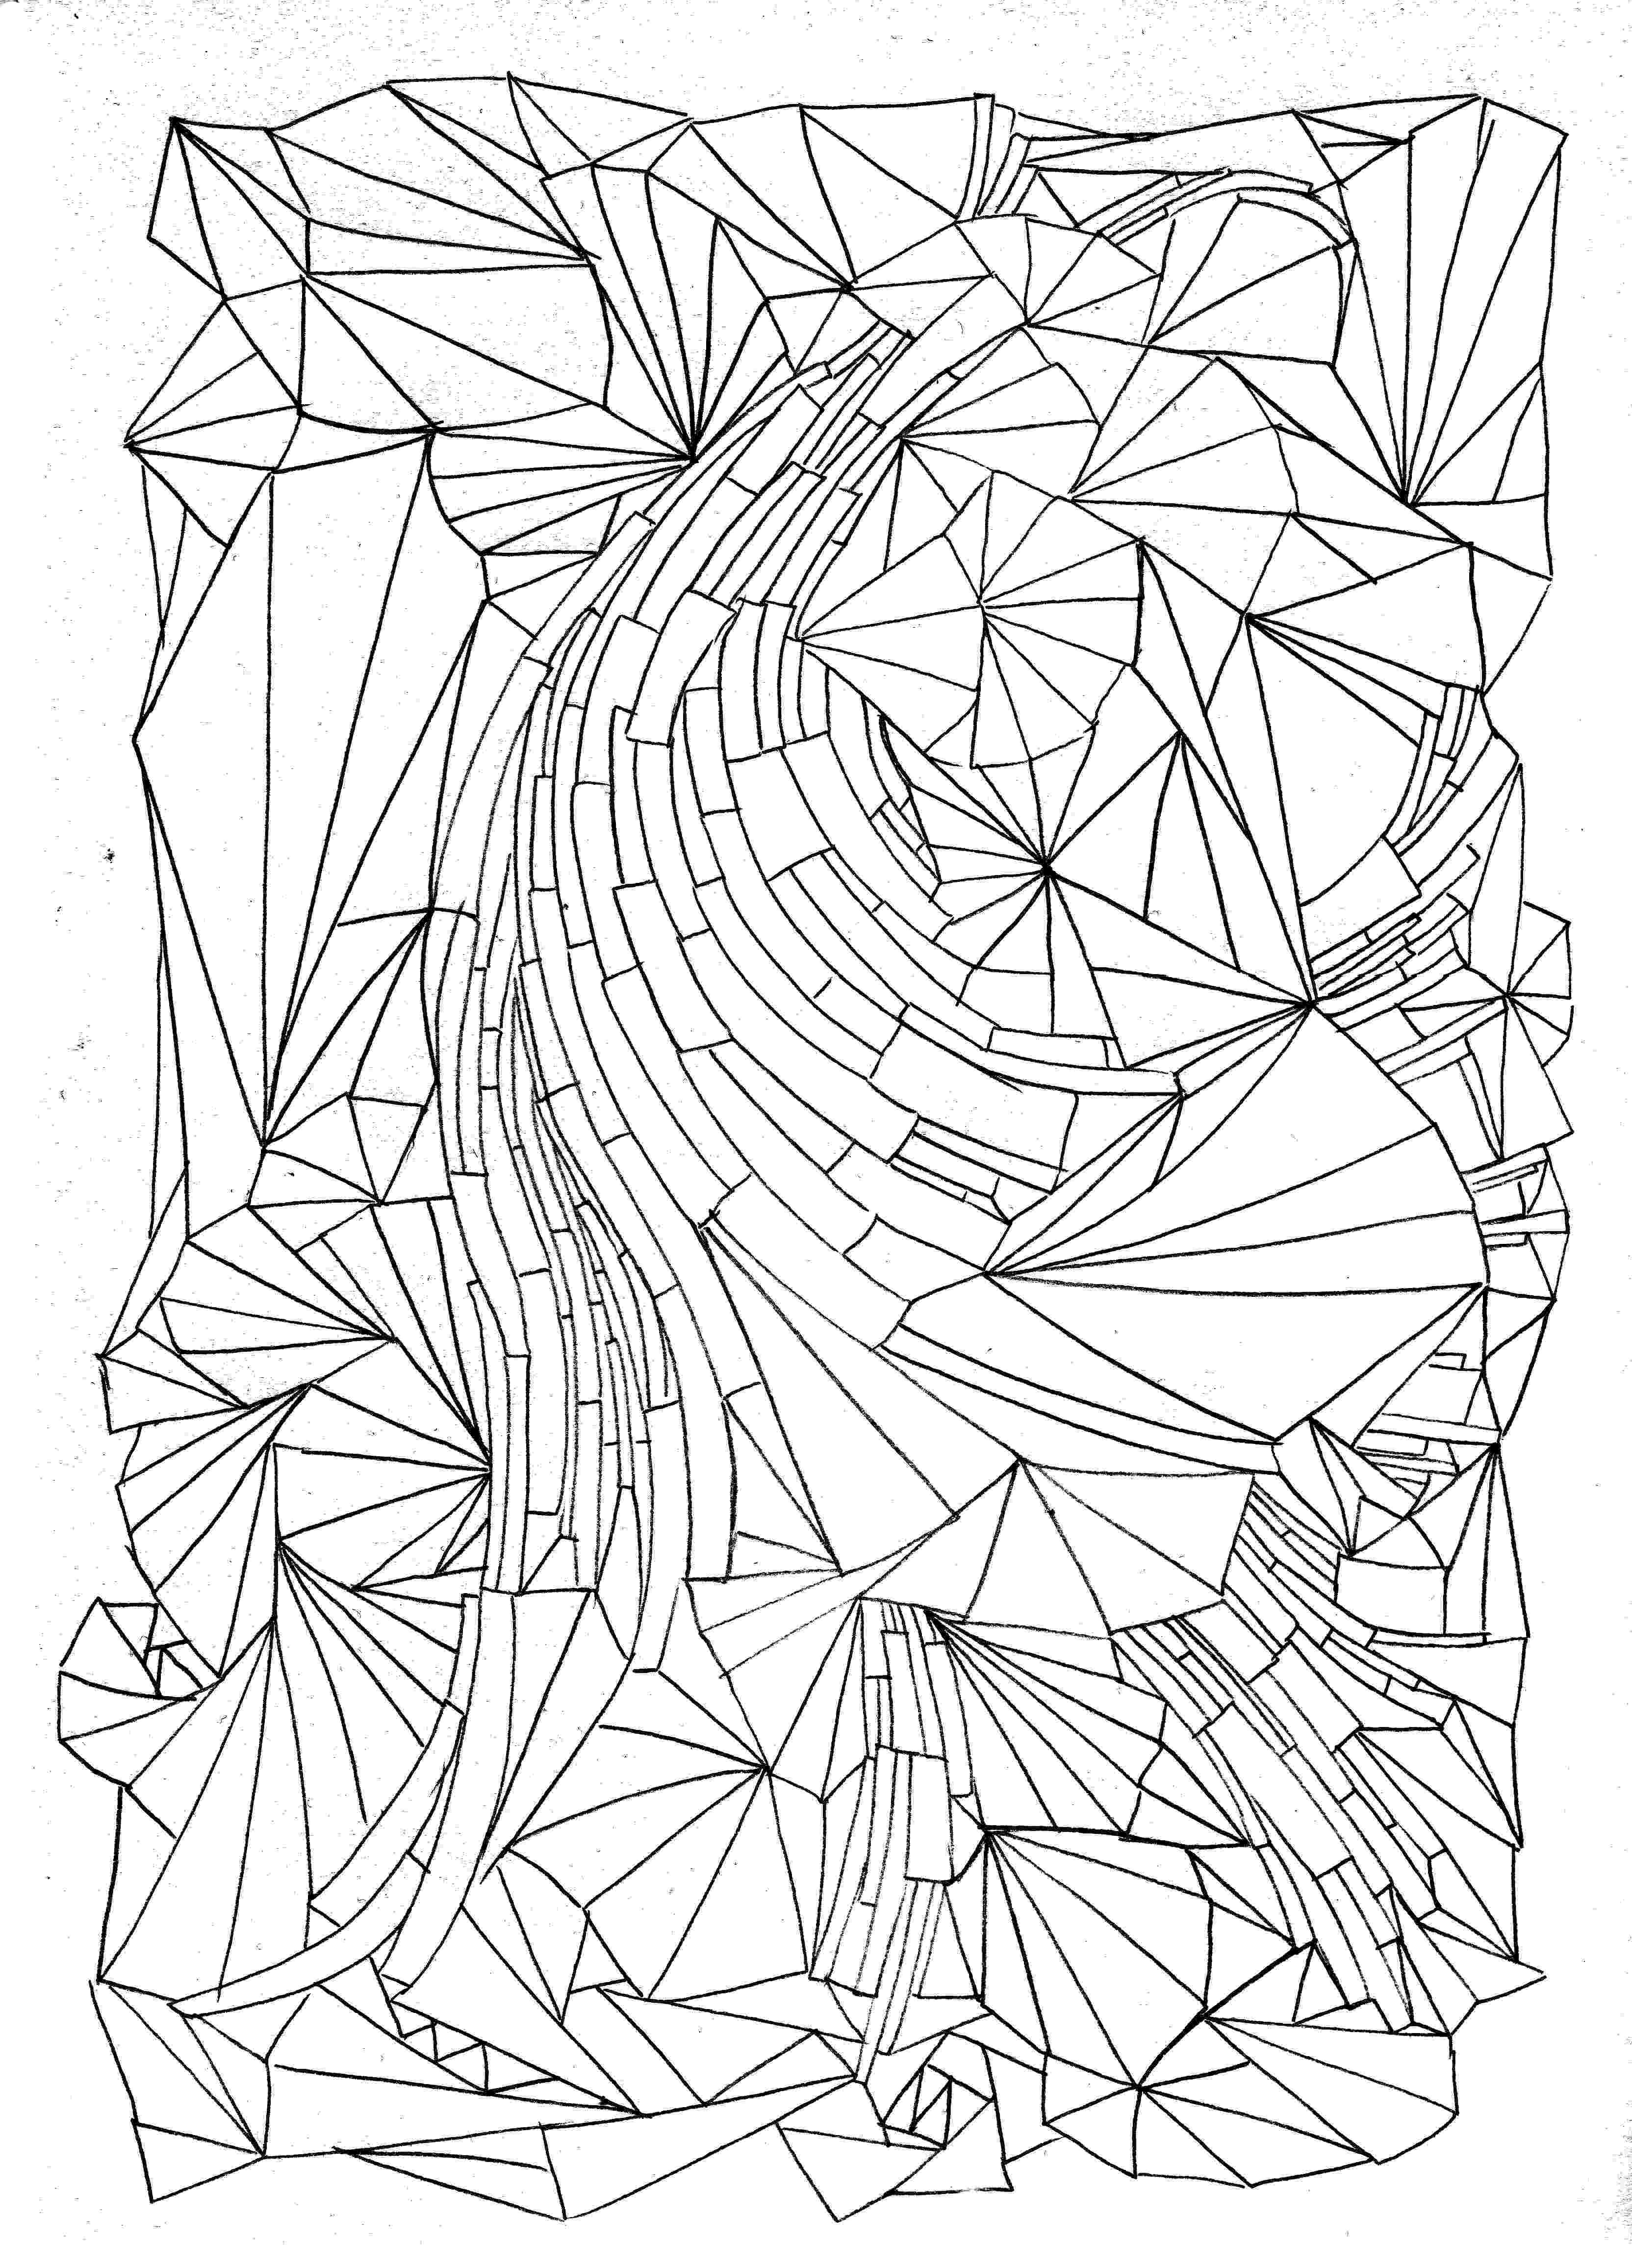 design coloring page free printable geometric coloring pages for adults coloring design page